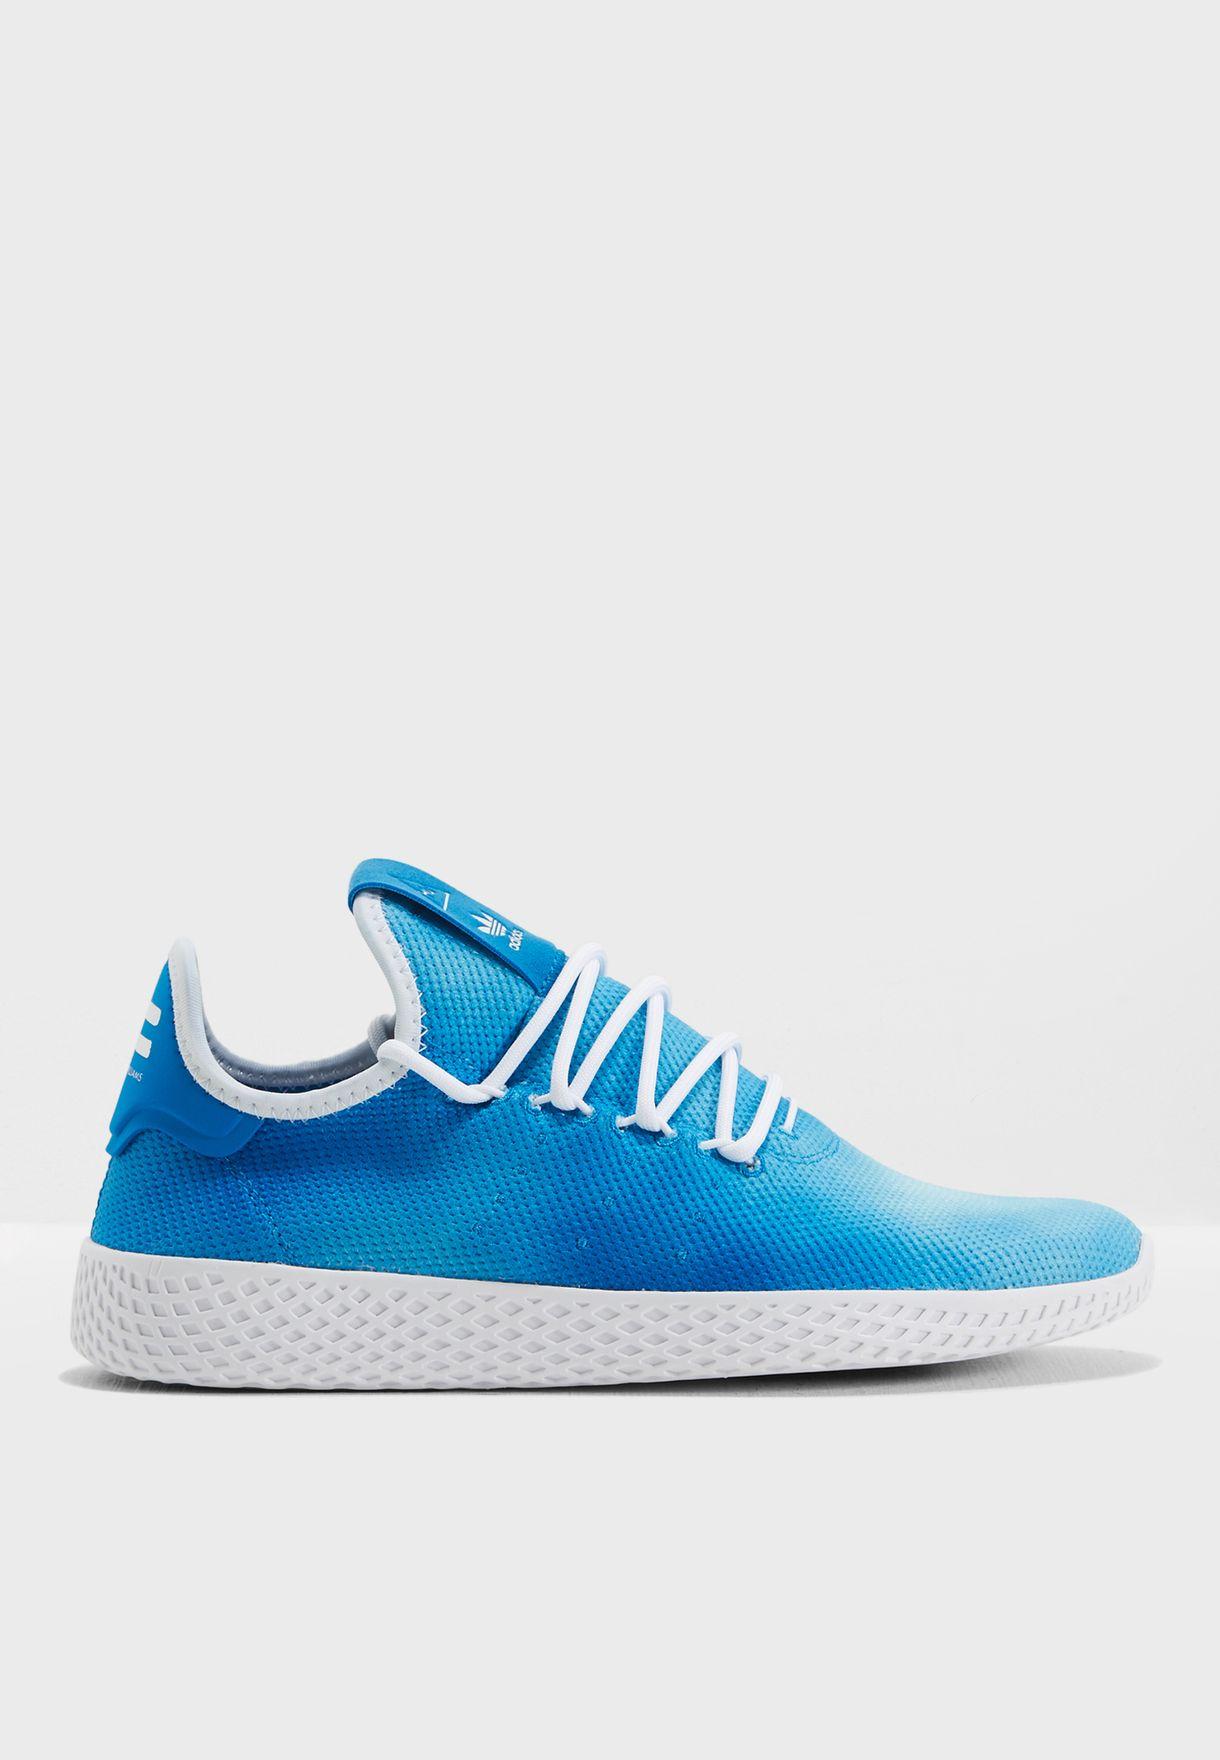 b1fd12a724097 Shop adidas Originals blue Pharrell Williams Hu Holi Tennis DA9618 for  Women in UAE - AD478SH73IES